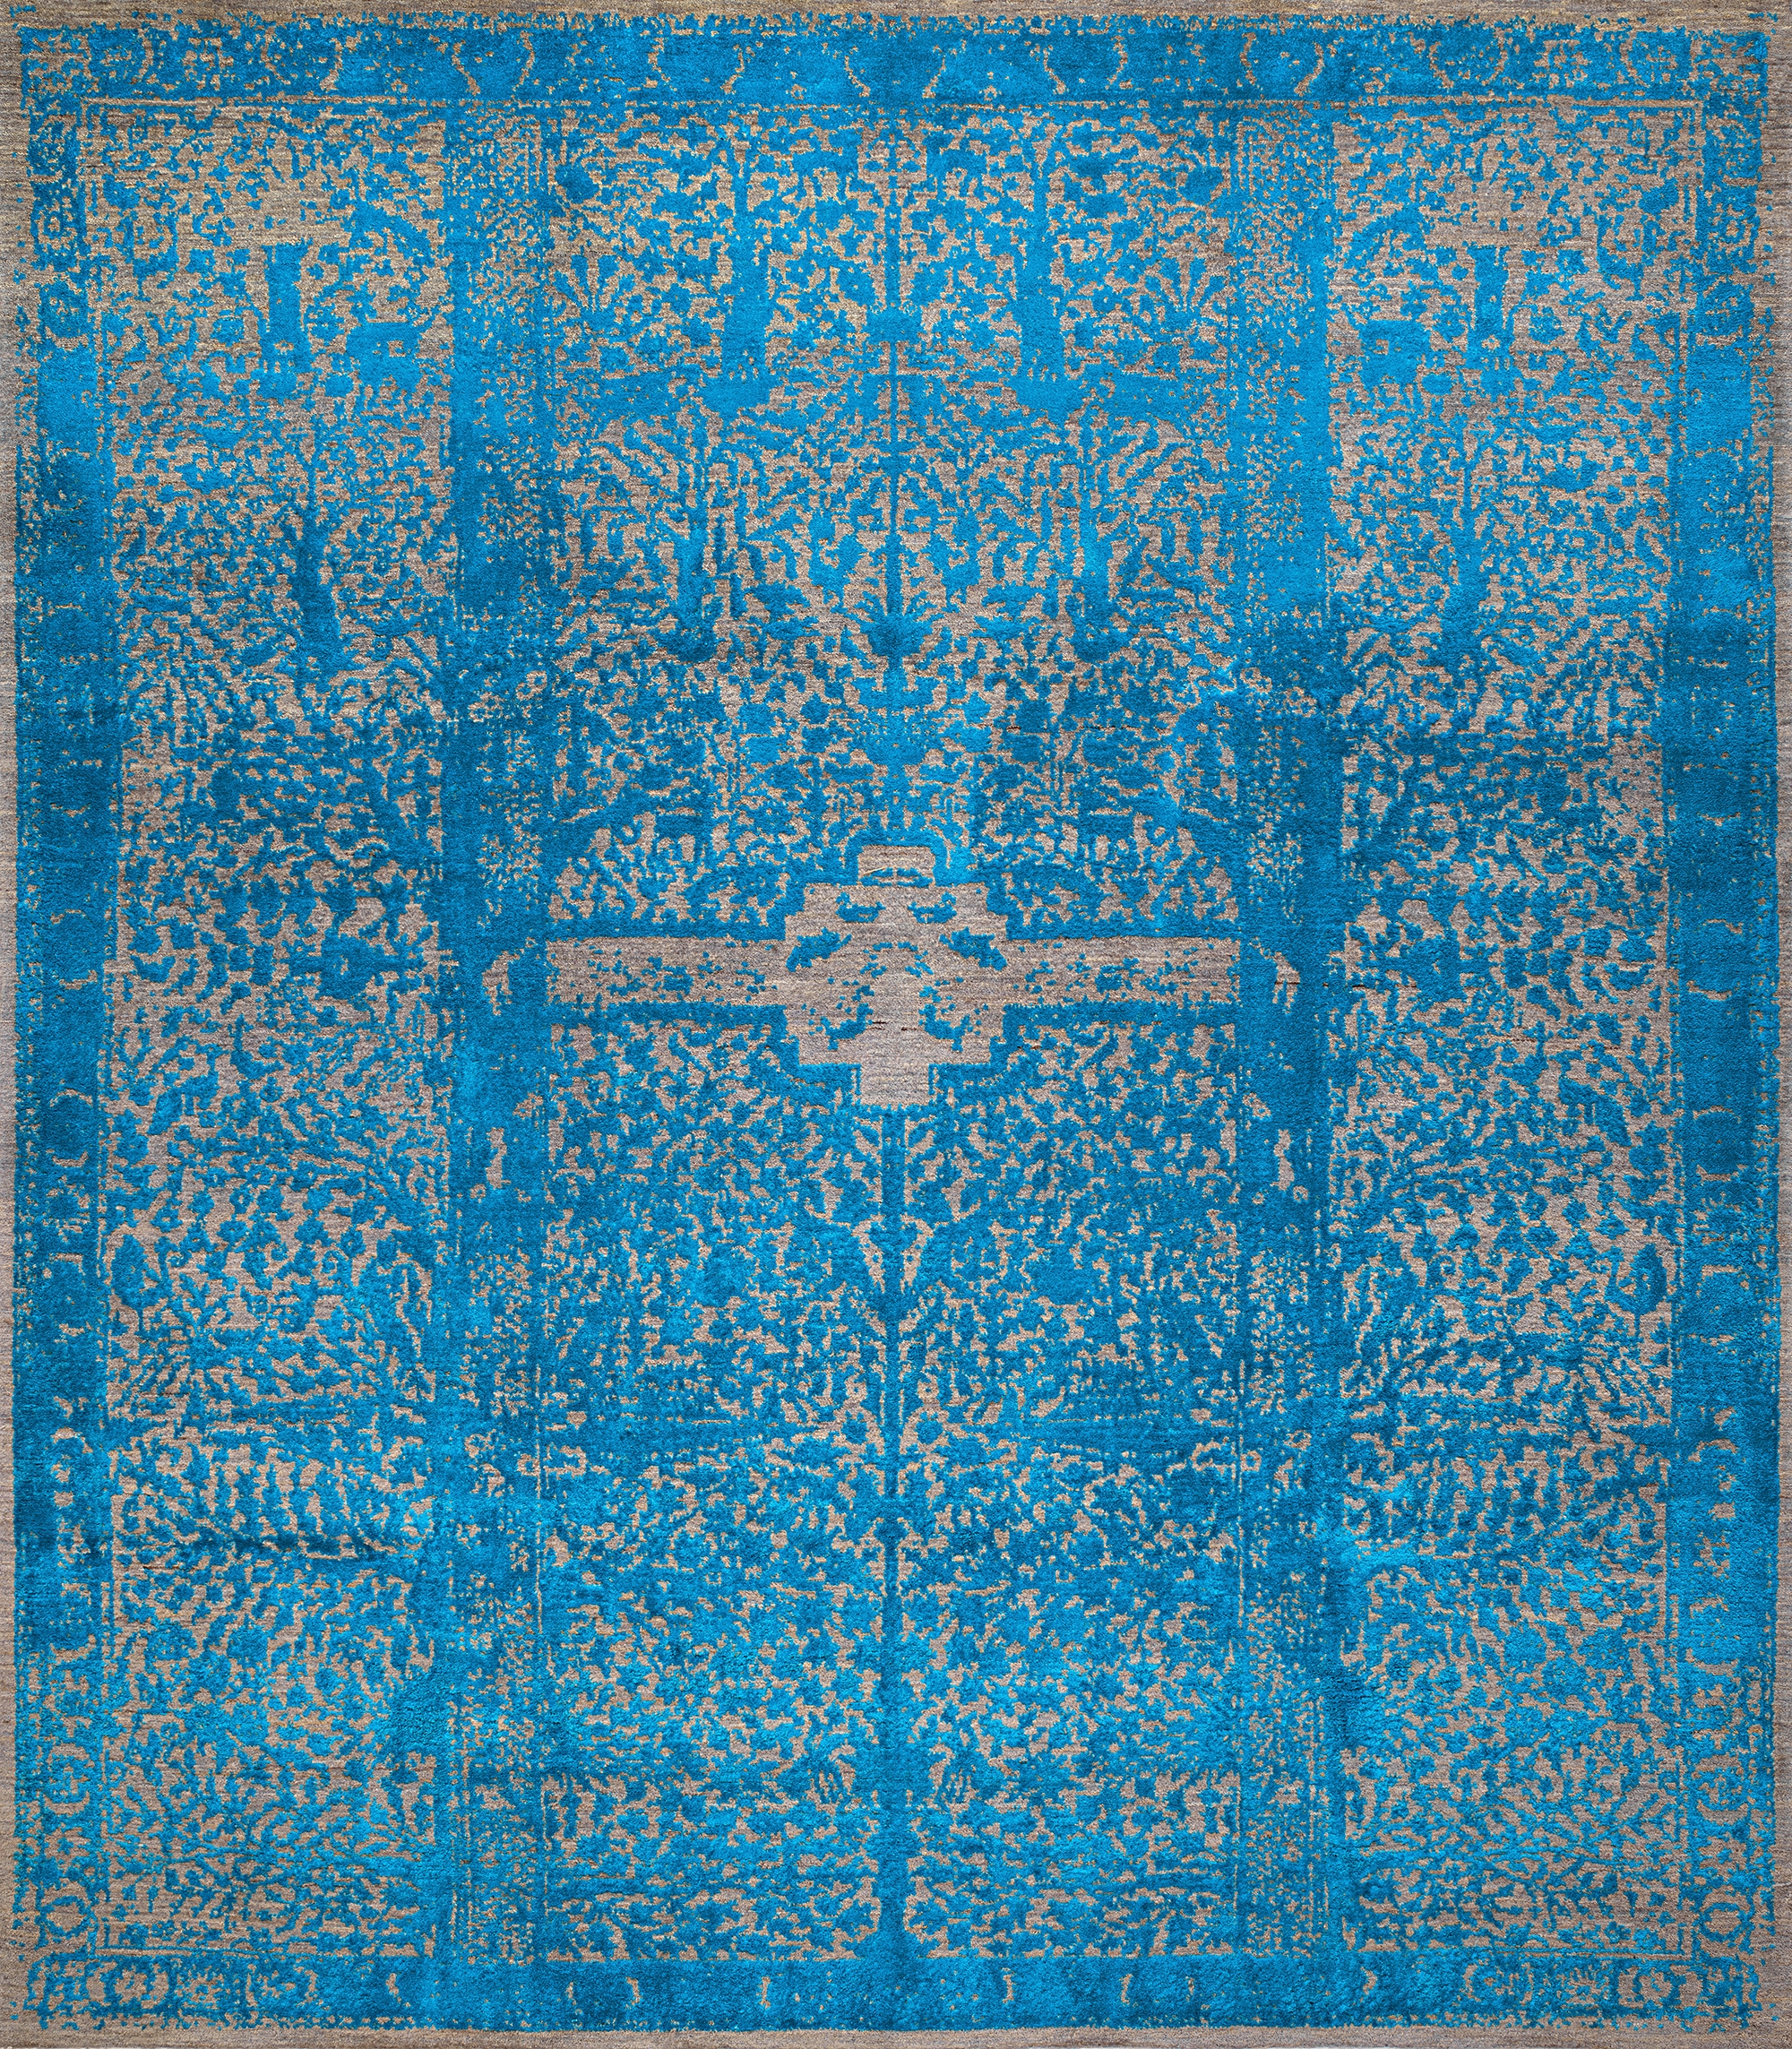 Classical Garden in Vibrant Blue PR 248 x 290cm